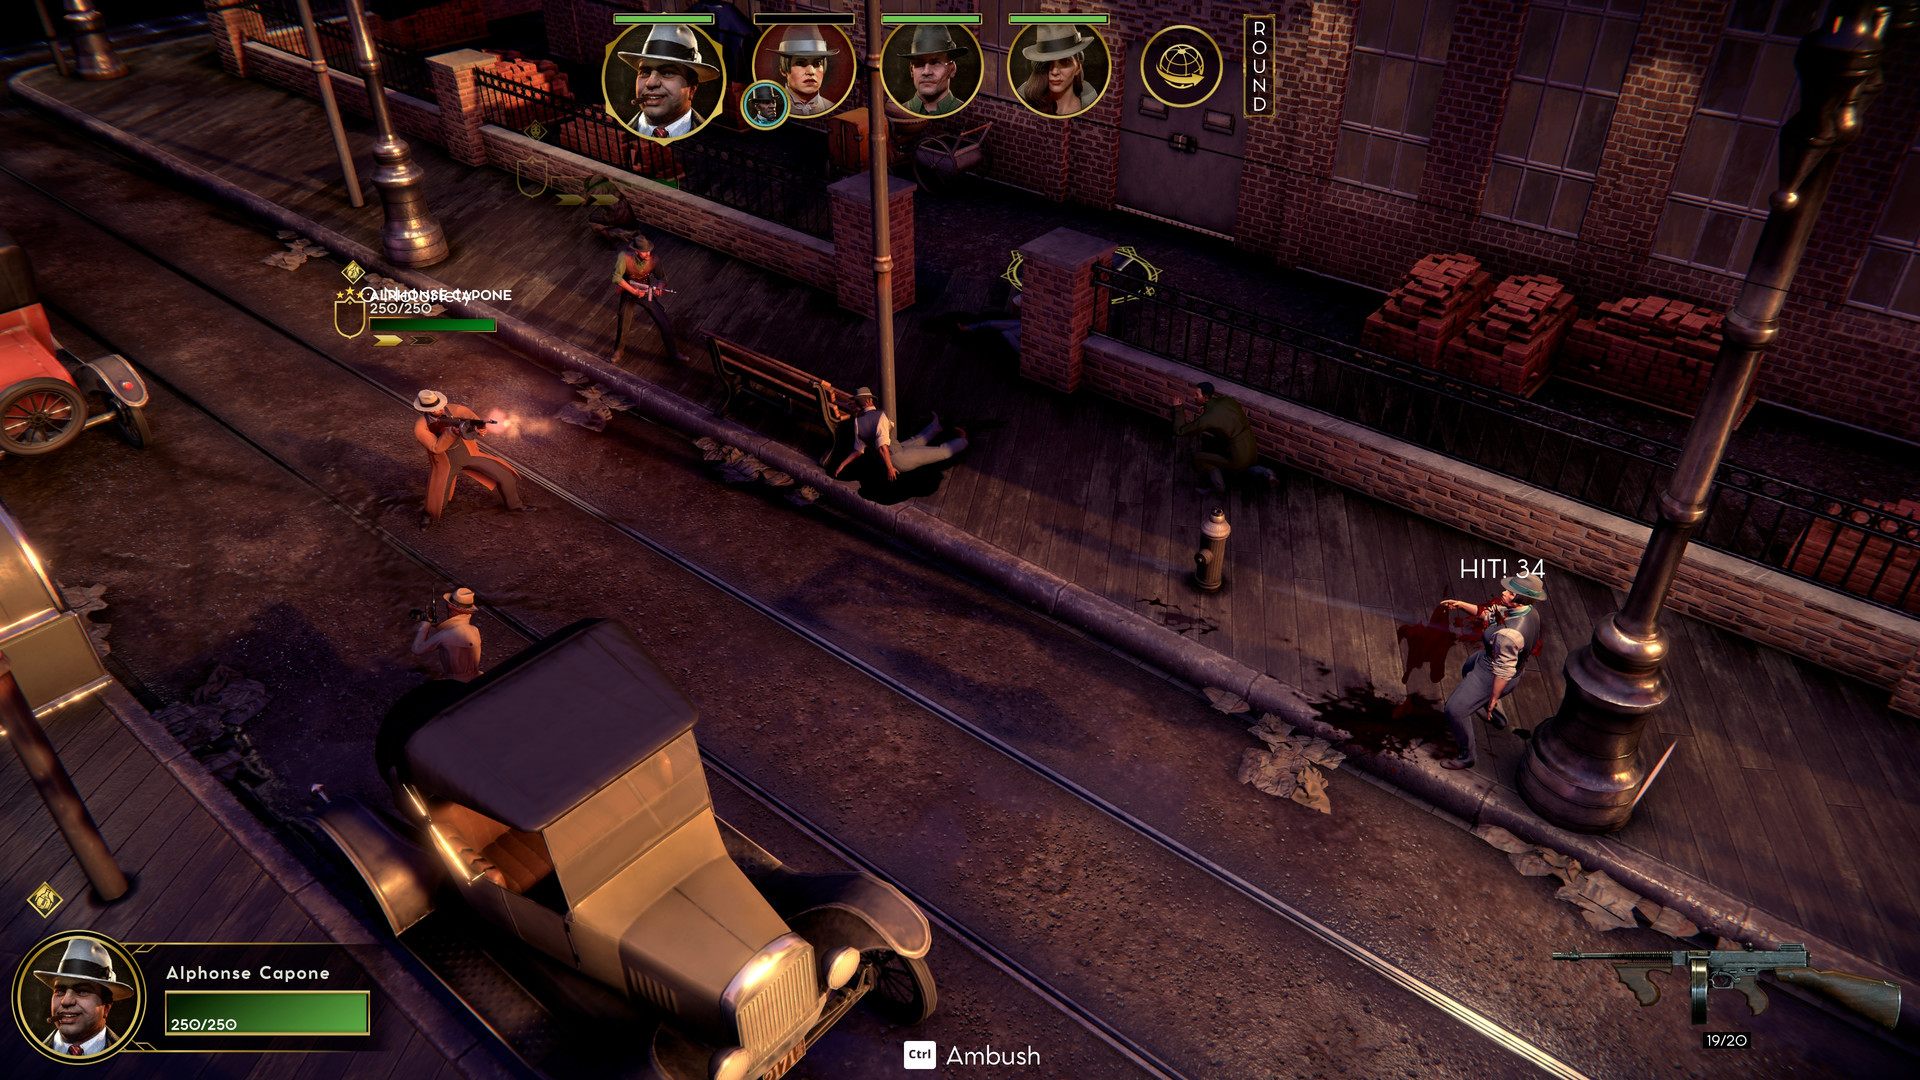 empire-of-sin-pc-screenshot-01